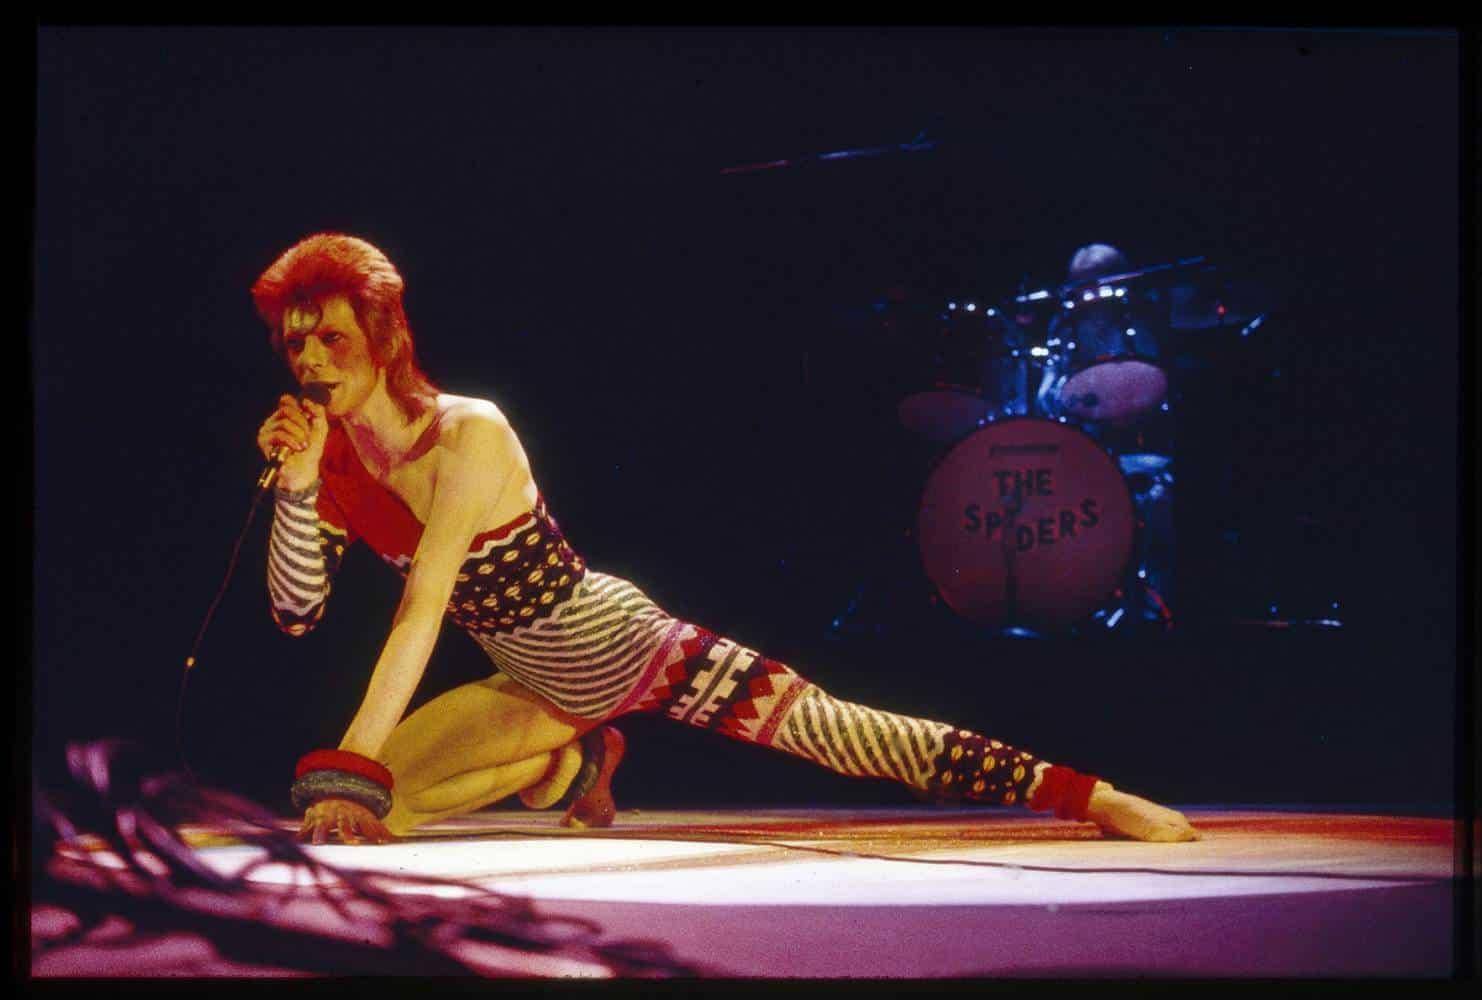 Fashion Helps You to Advance; David Bowie